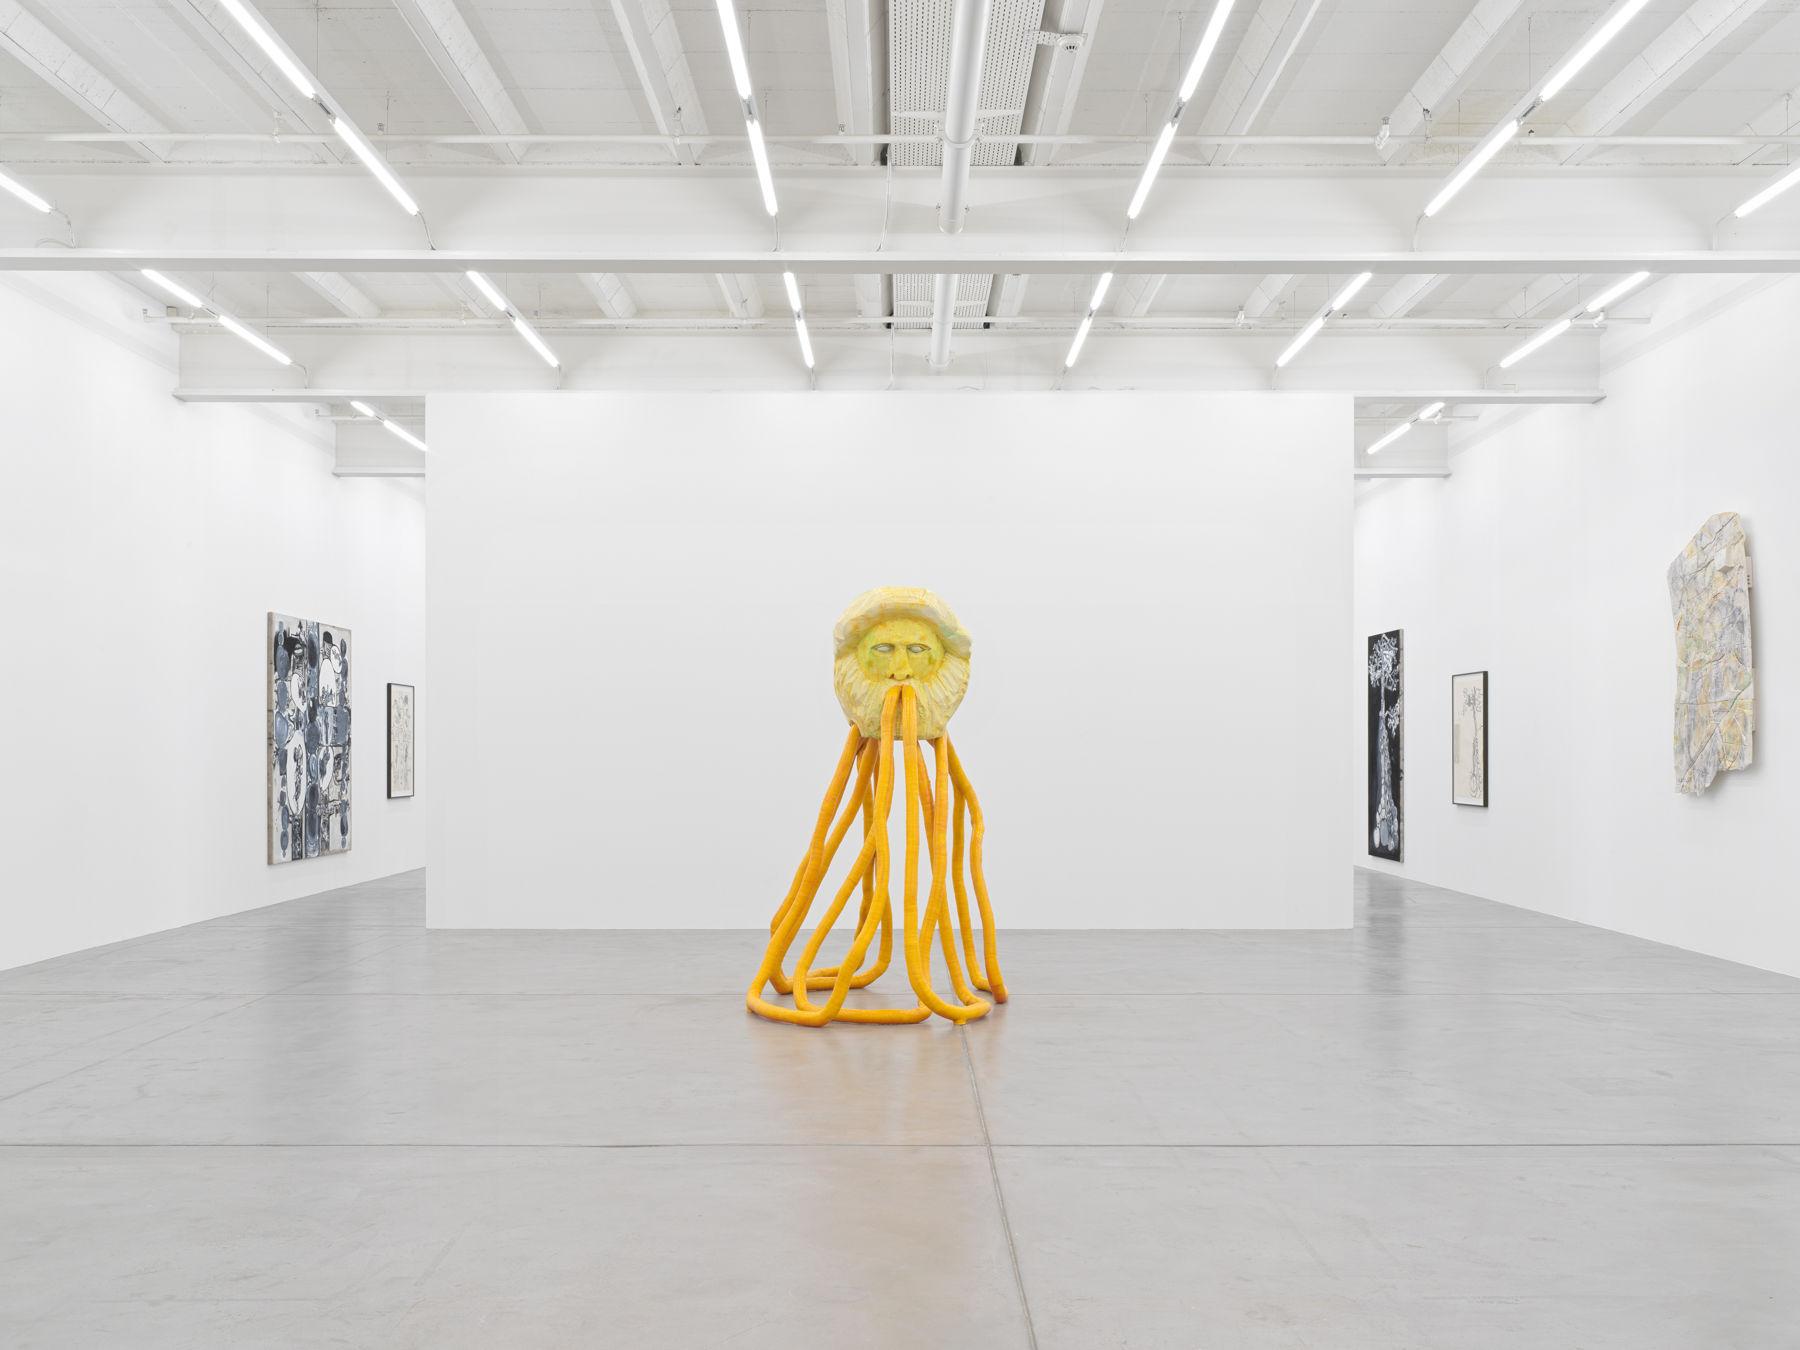 Galerie Eva Presenhuber Justin Matherly 1